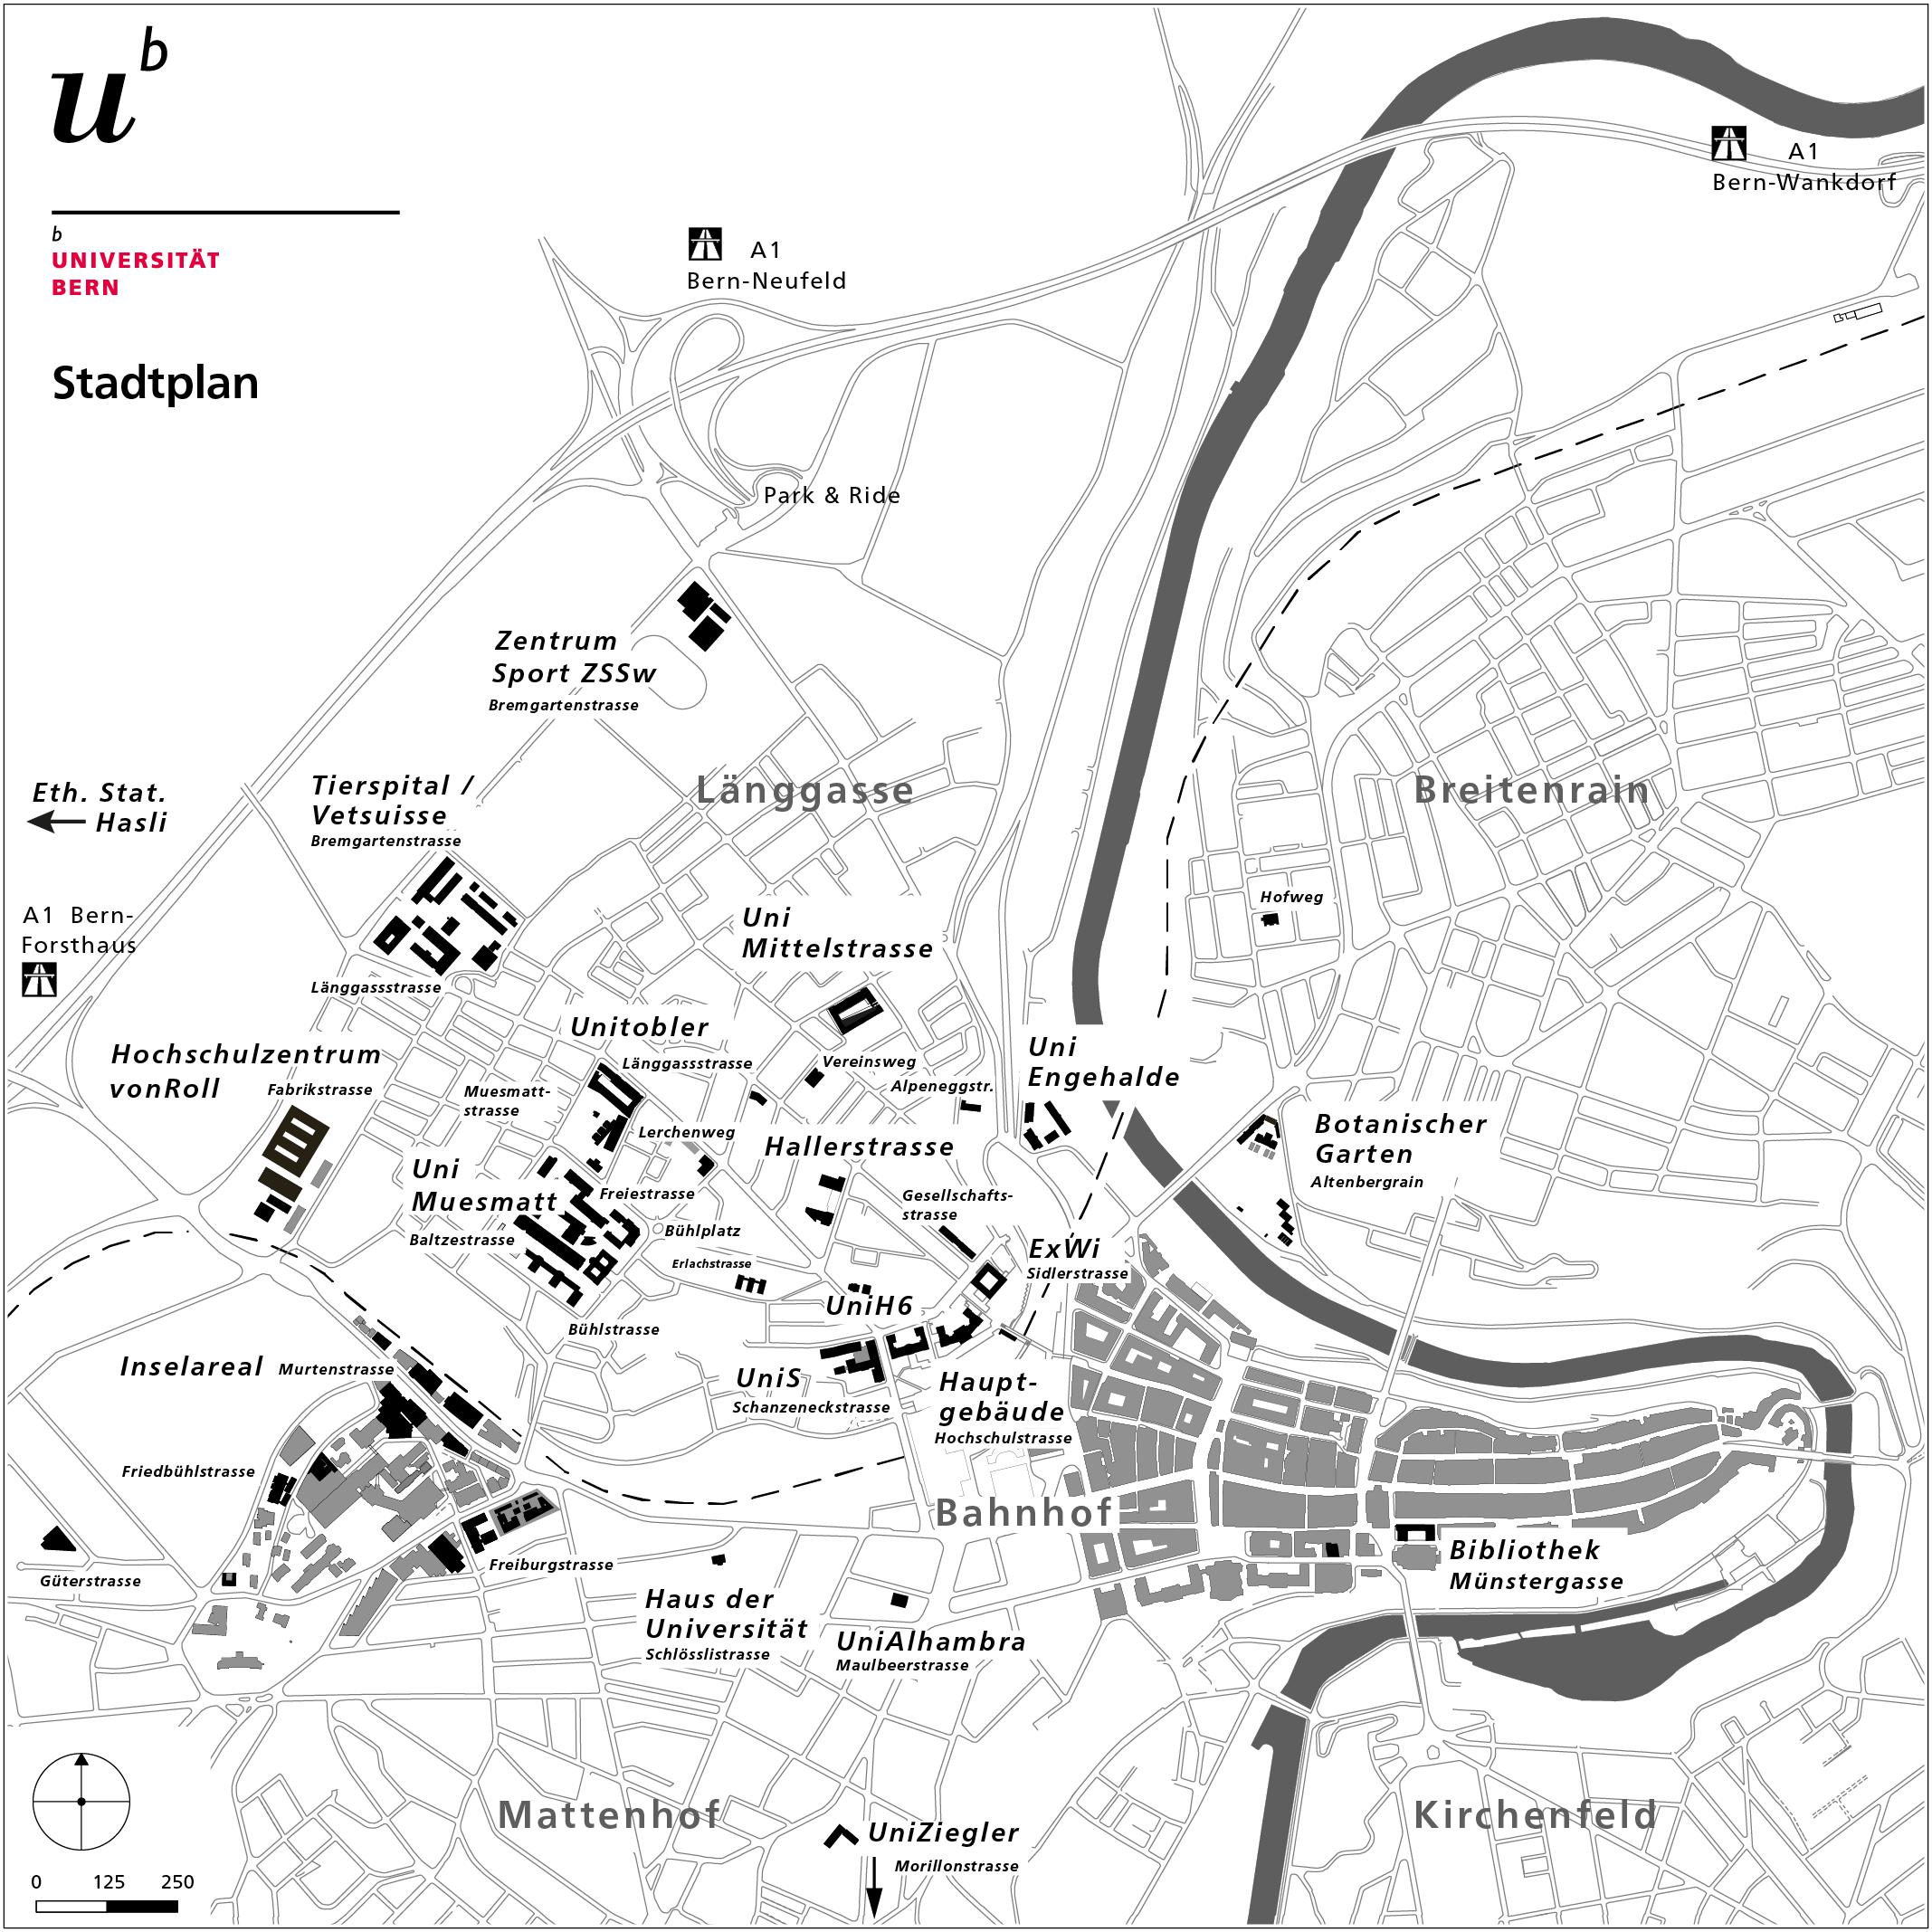 University: Maps - University of Bern